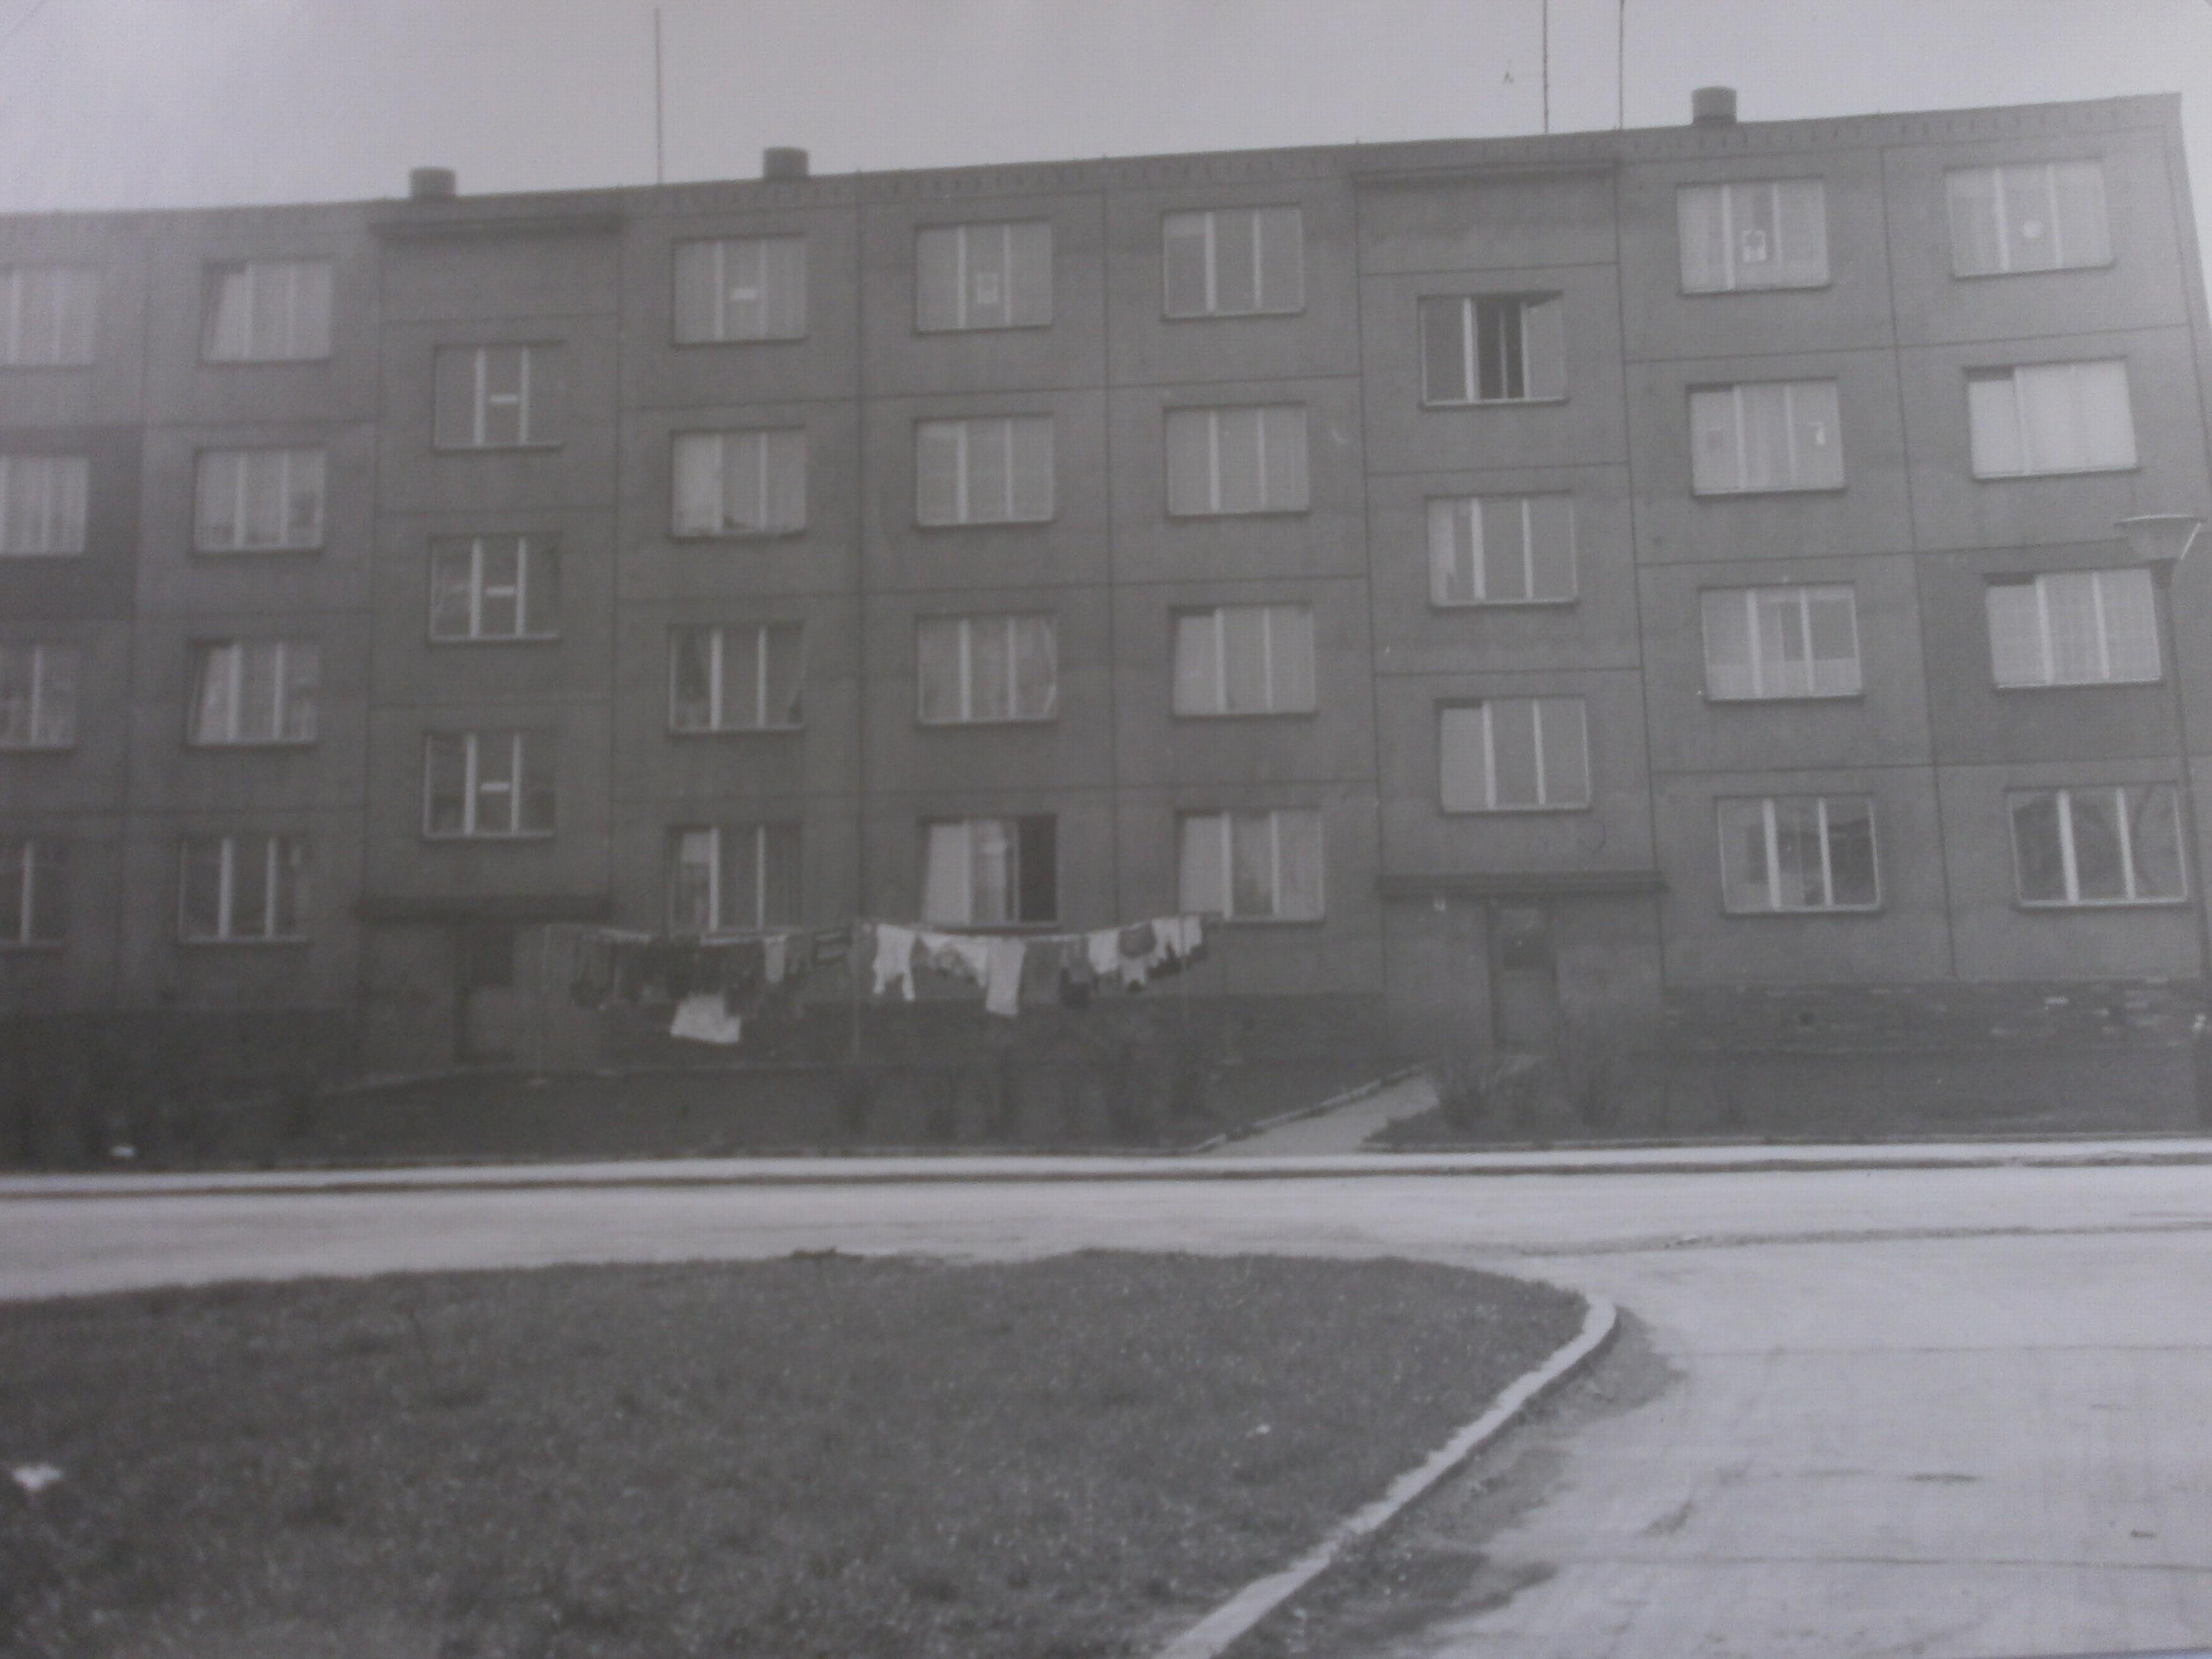 402-Pohled_na_panelovy_dum_c.p._152_-_153_(1974).JPG